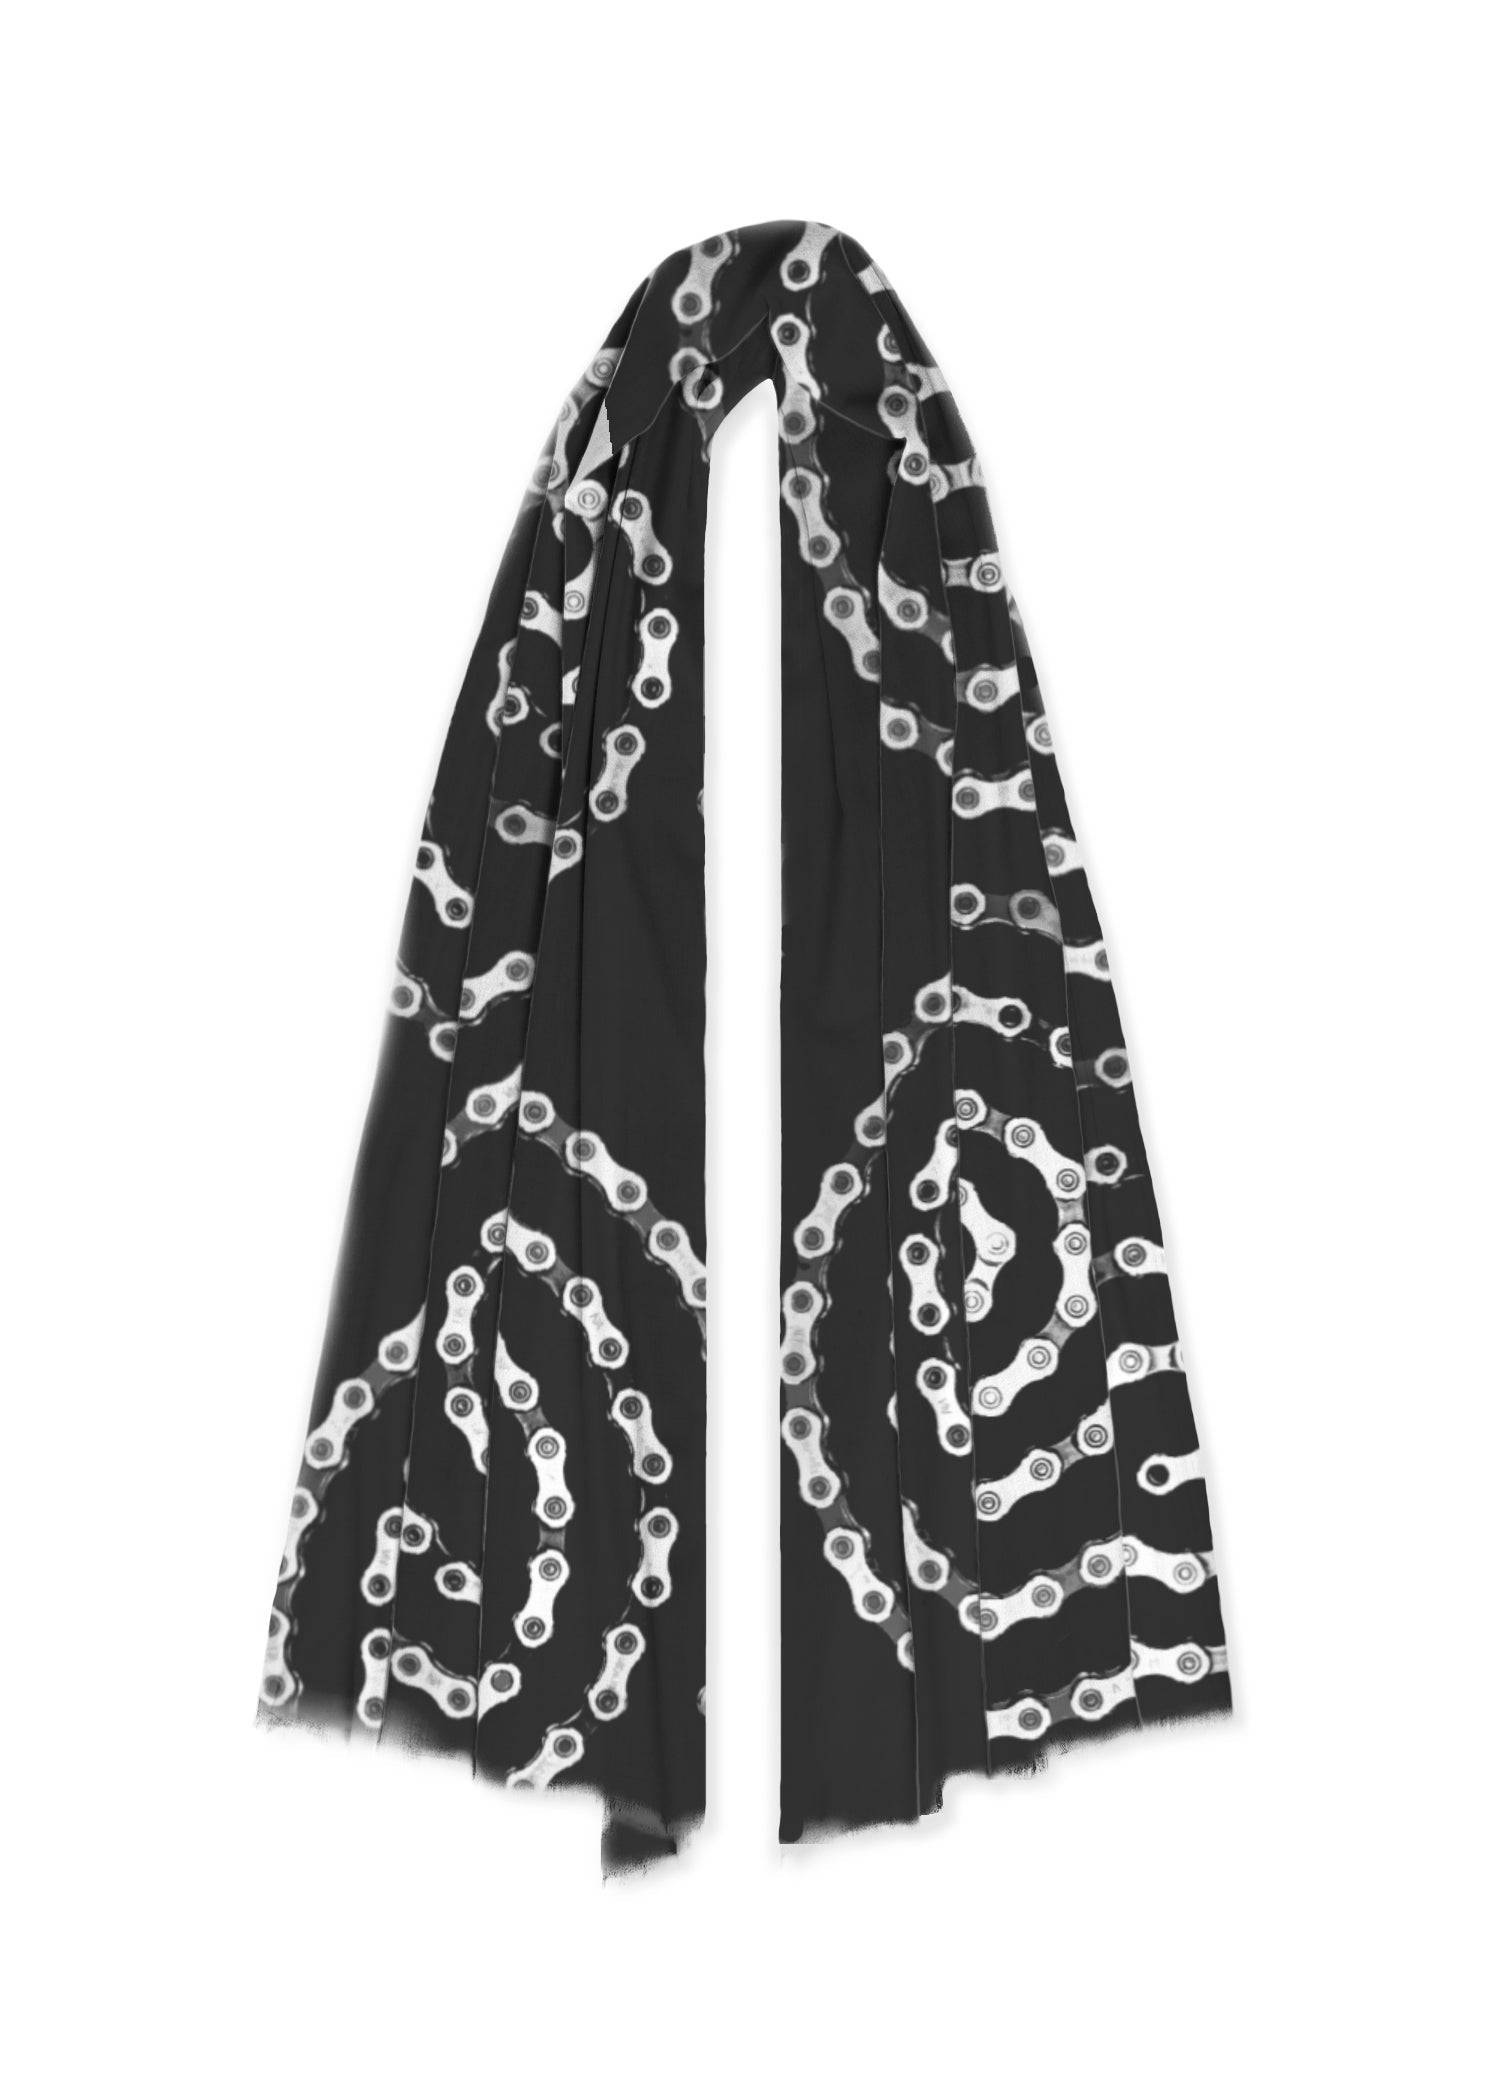 VIDA 100% Cashmere Scarf - Bike Chain Spiral by VIDA Original Artist  - Size: One Size